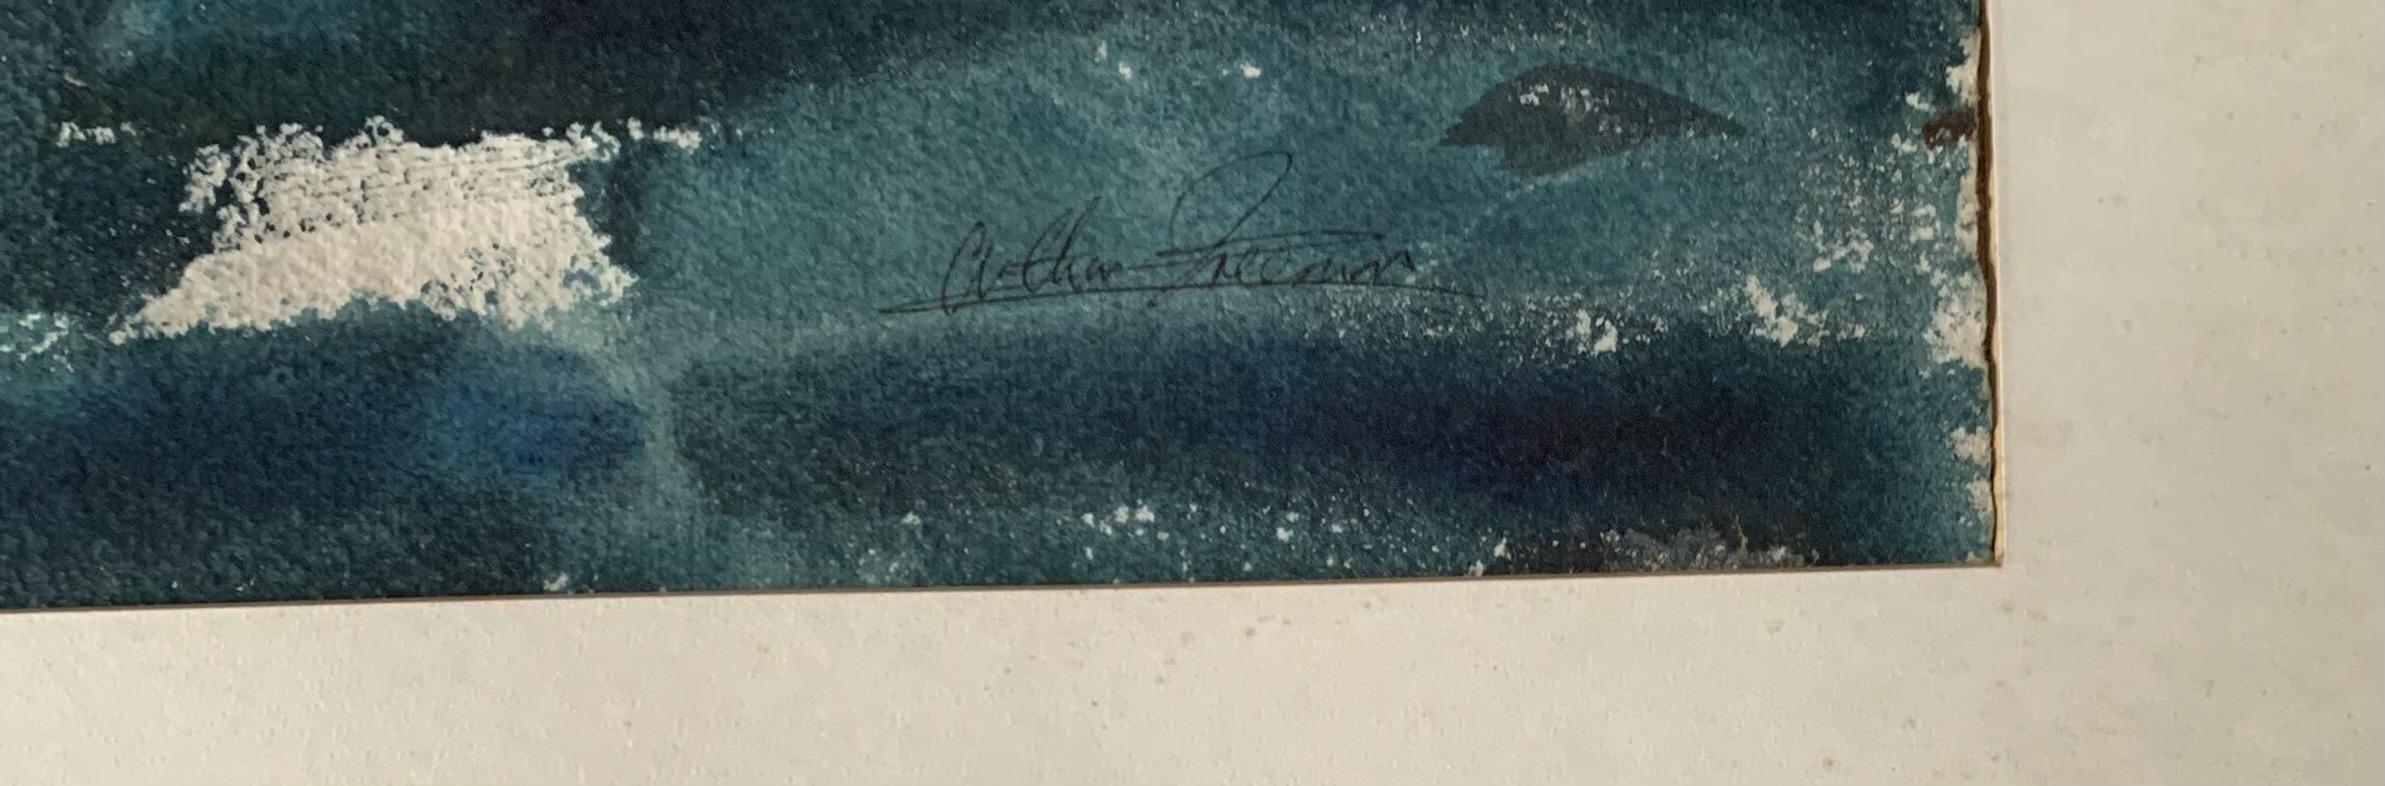 "Acrylic abstract by Arthur Freeman, image 16"" x 13"", frame 21.5"" x 19"" - Image 2 of 3"